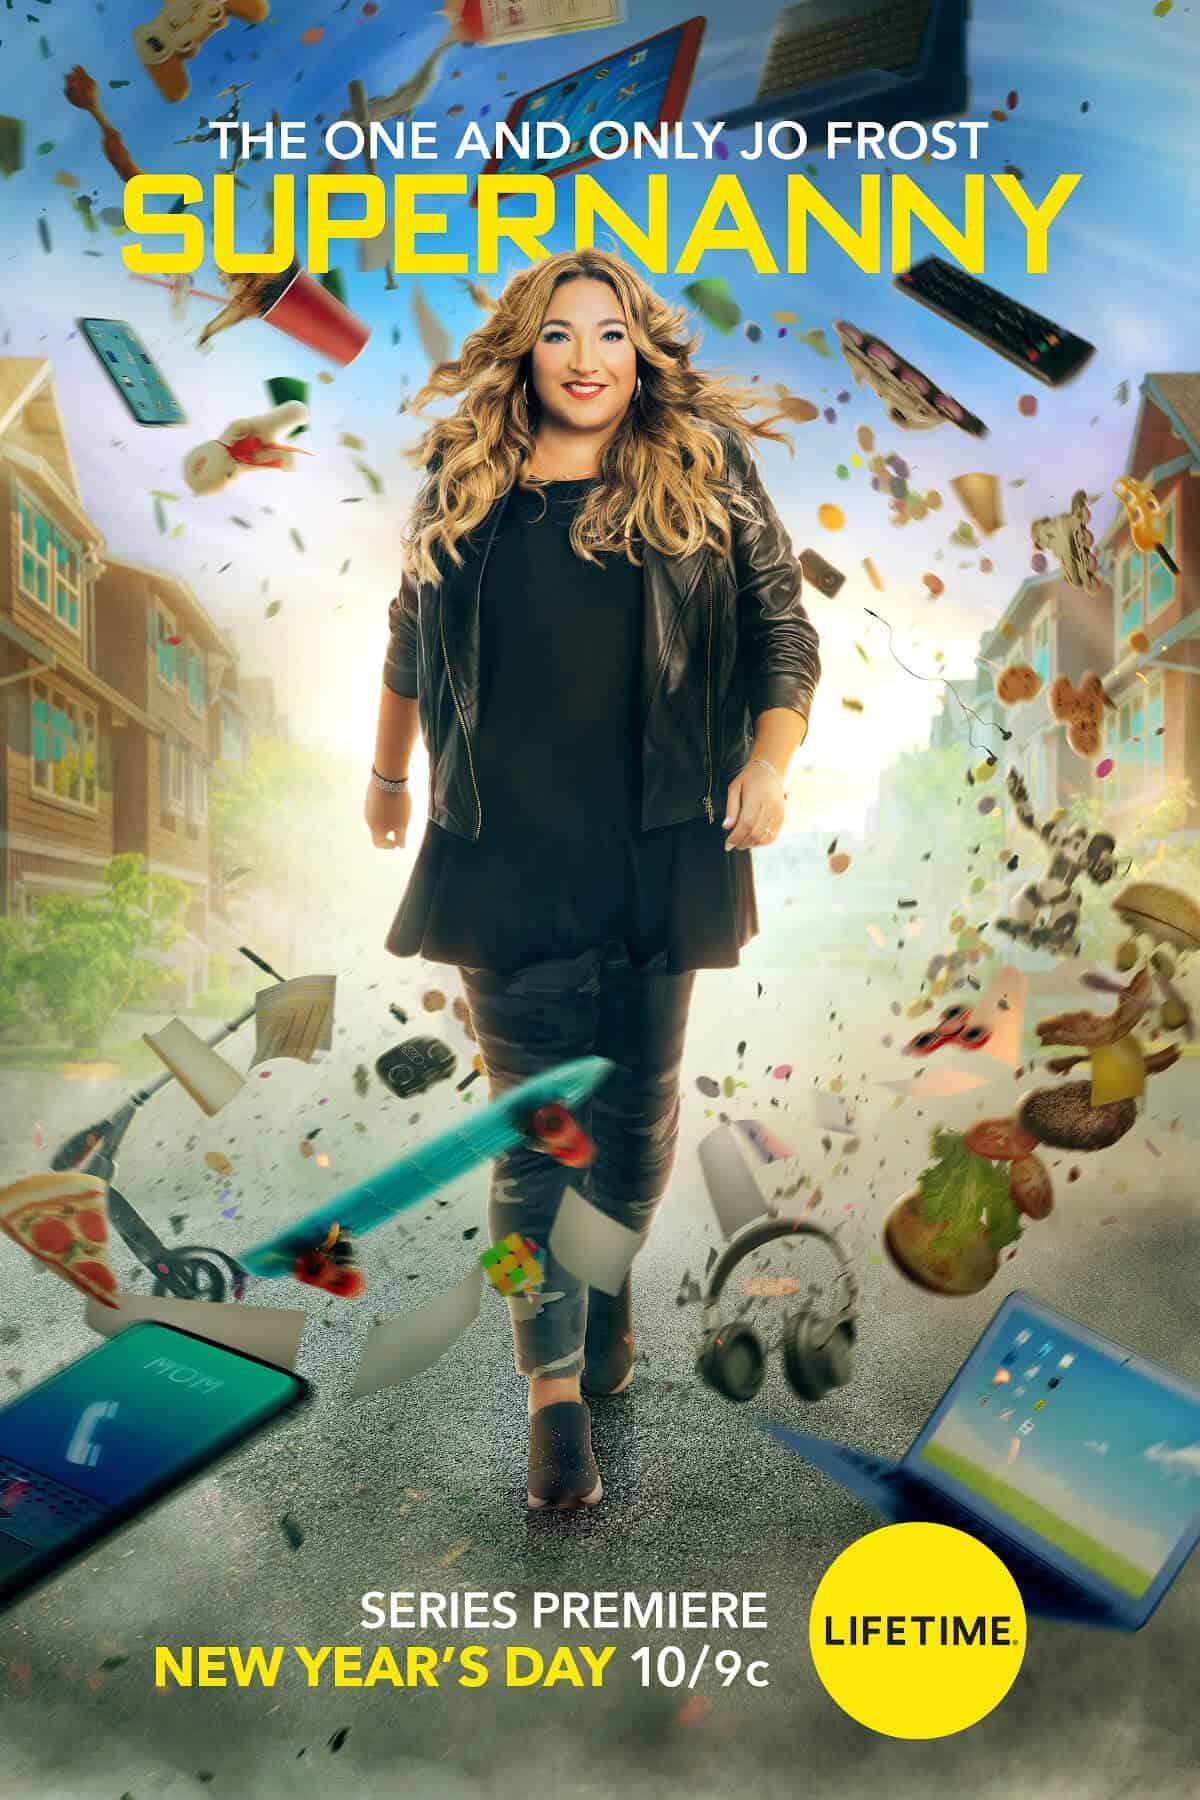 Supernanny 2020 Premiere